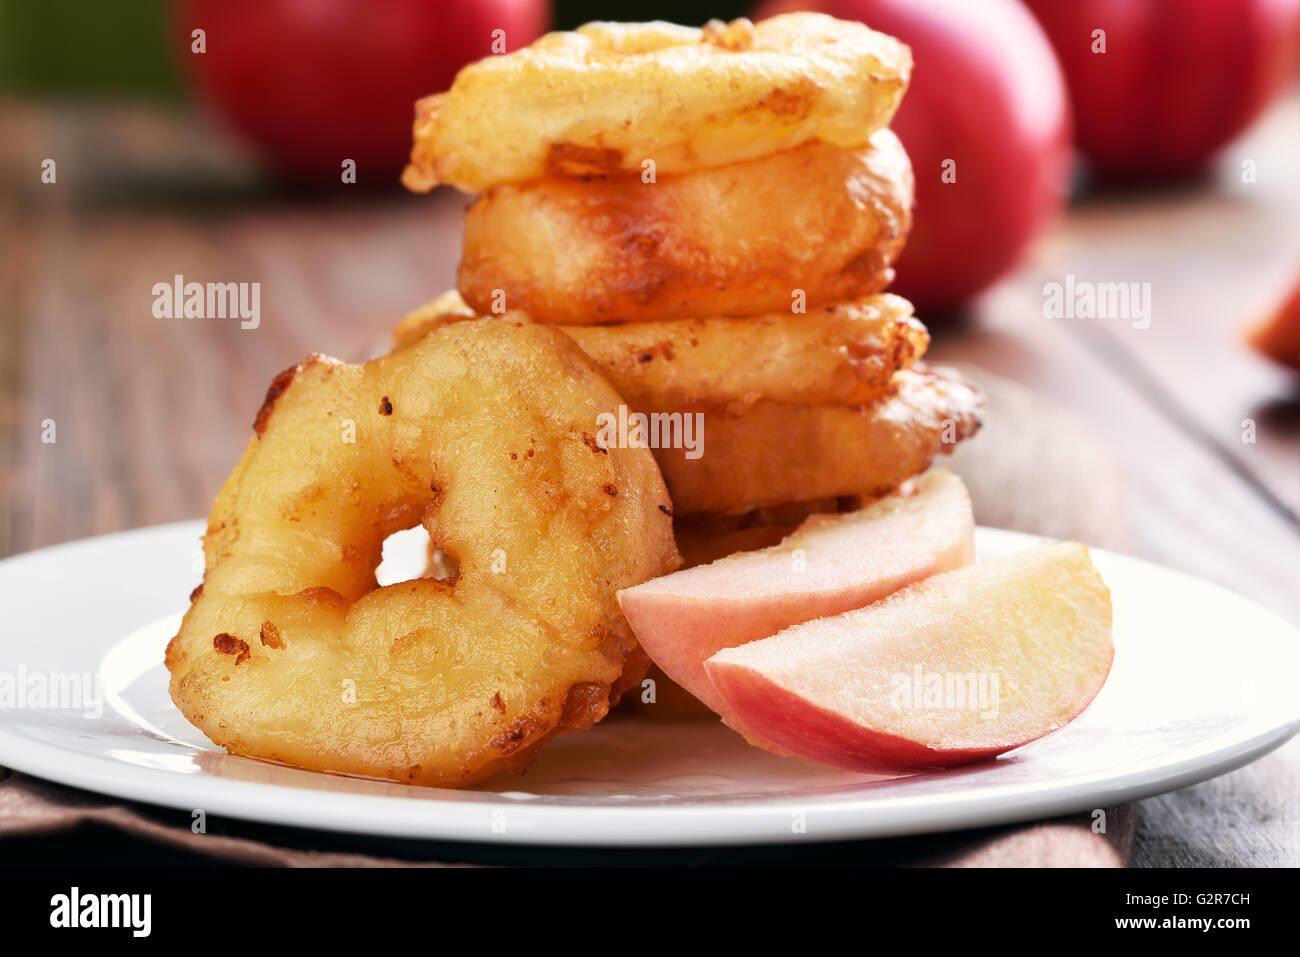 Apple rings on white plate - Stock Image